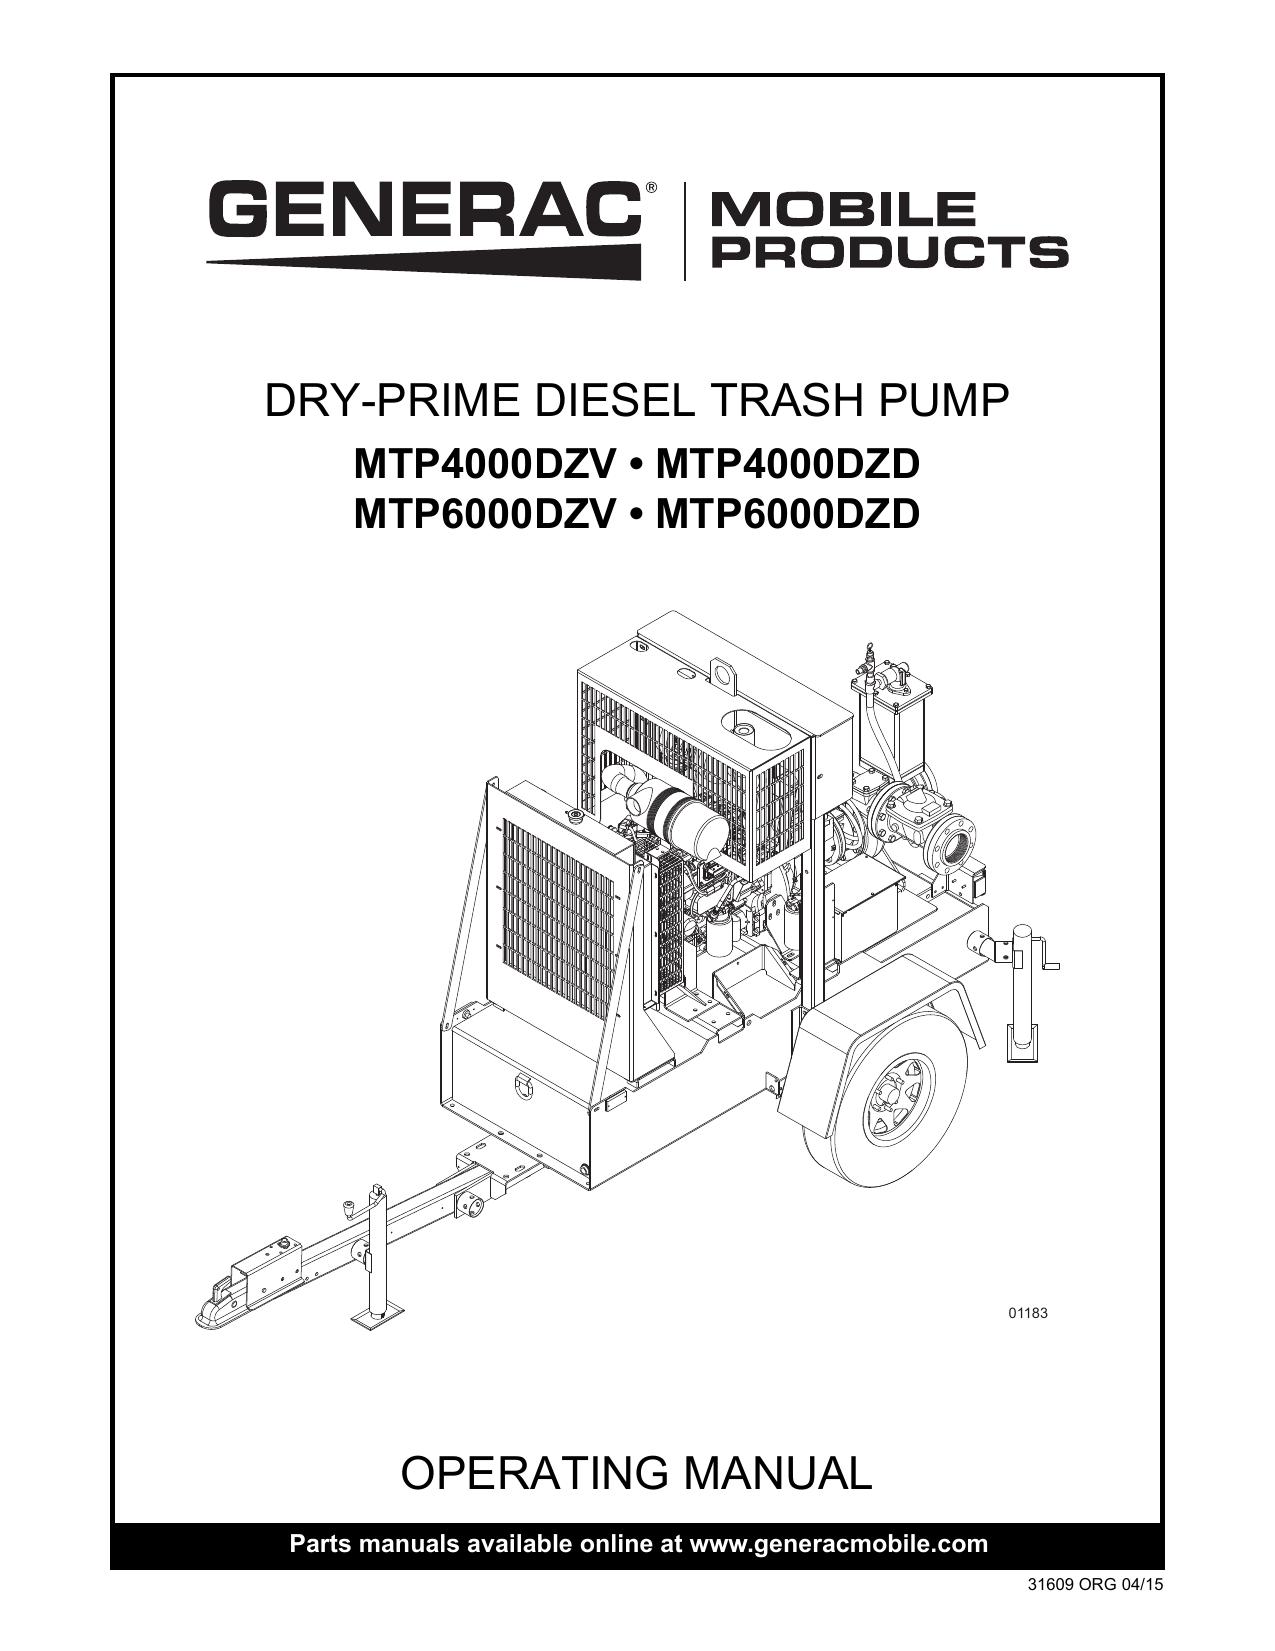 operating manual dry-prime diesel trash pump | manualzz com